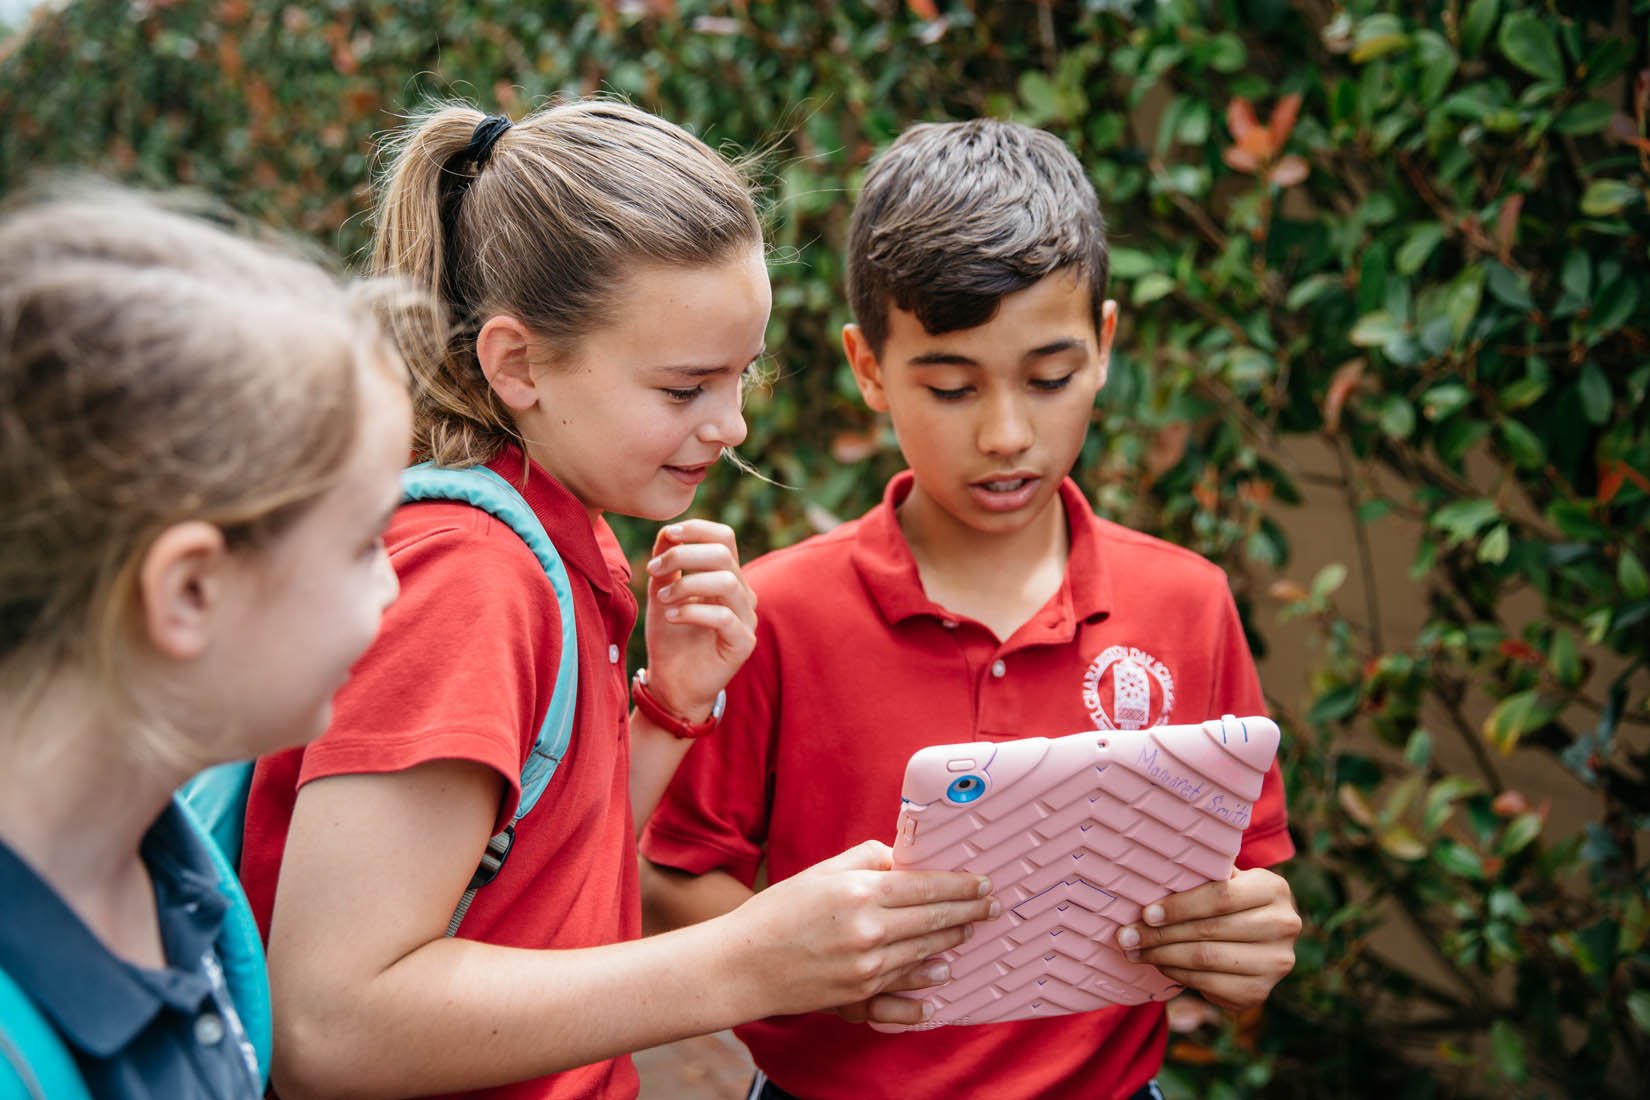 students outside look at ipad